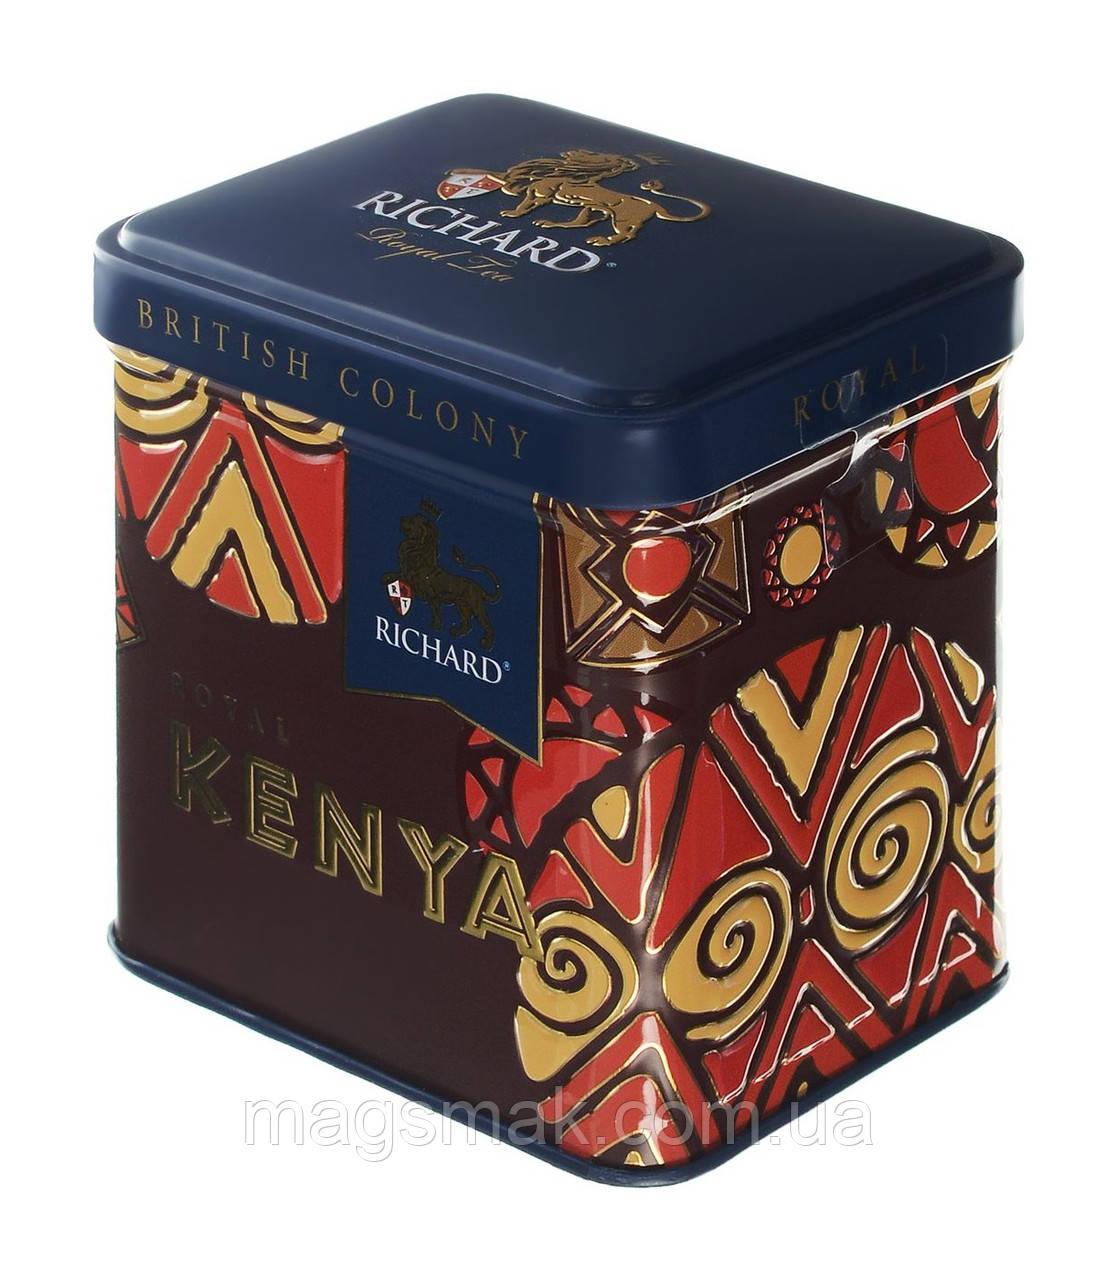 Чай Richard Royal Kenya, ж/б, листовой, 50 г